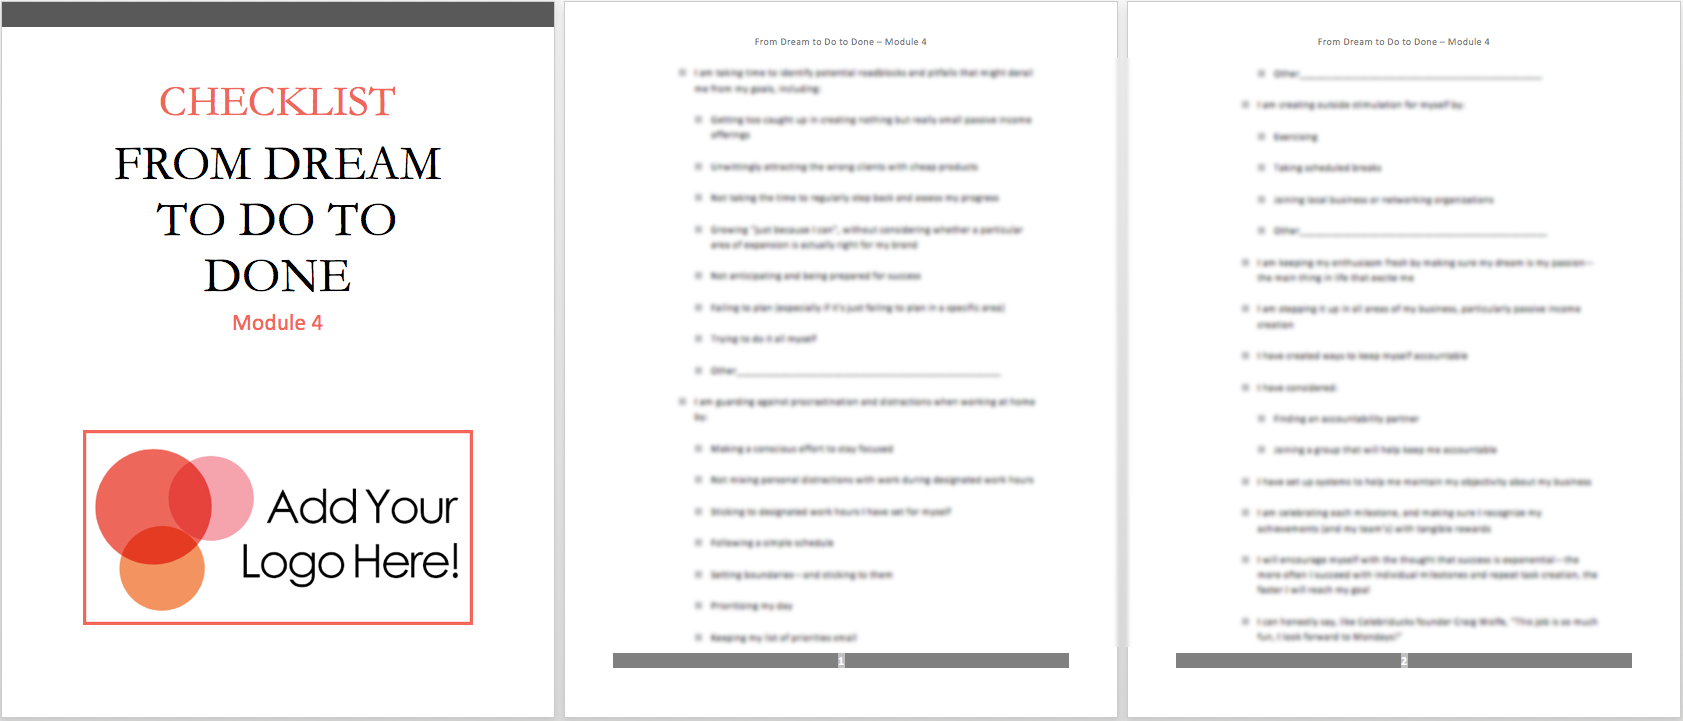 mod 4 checklist